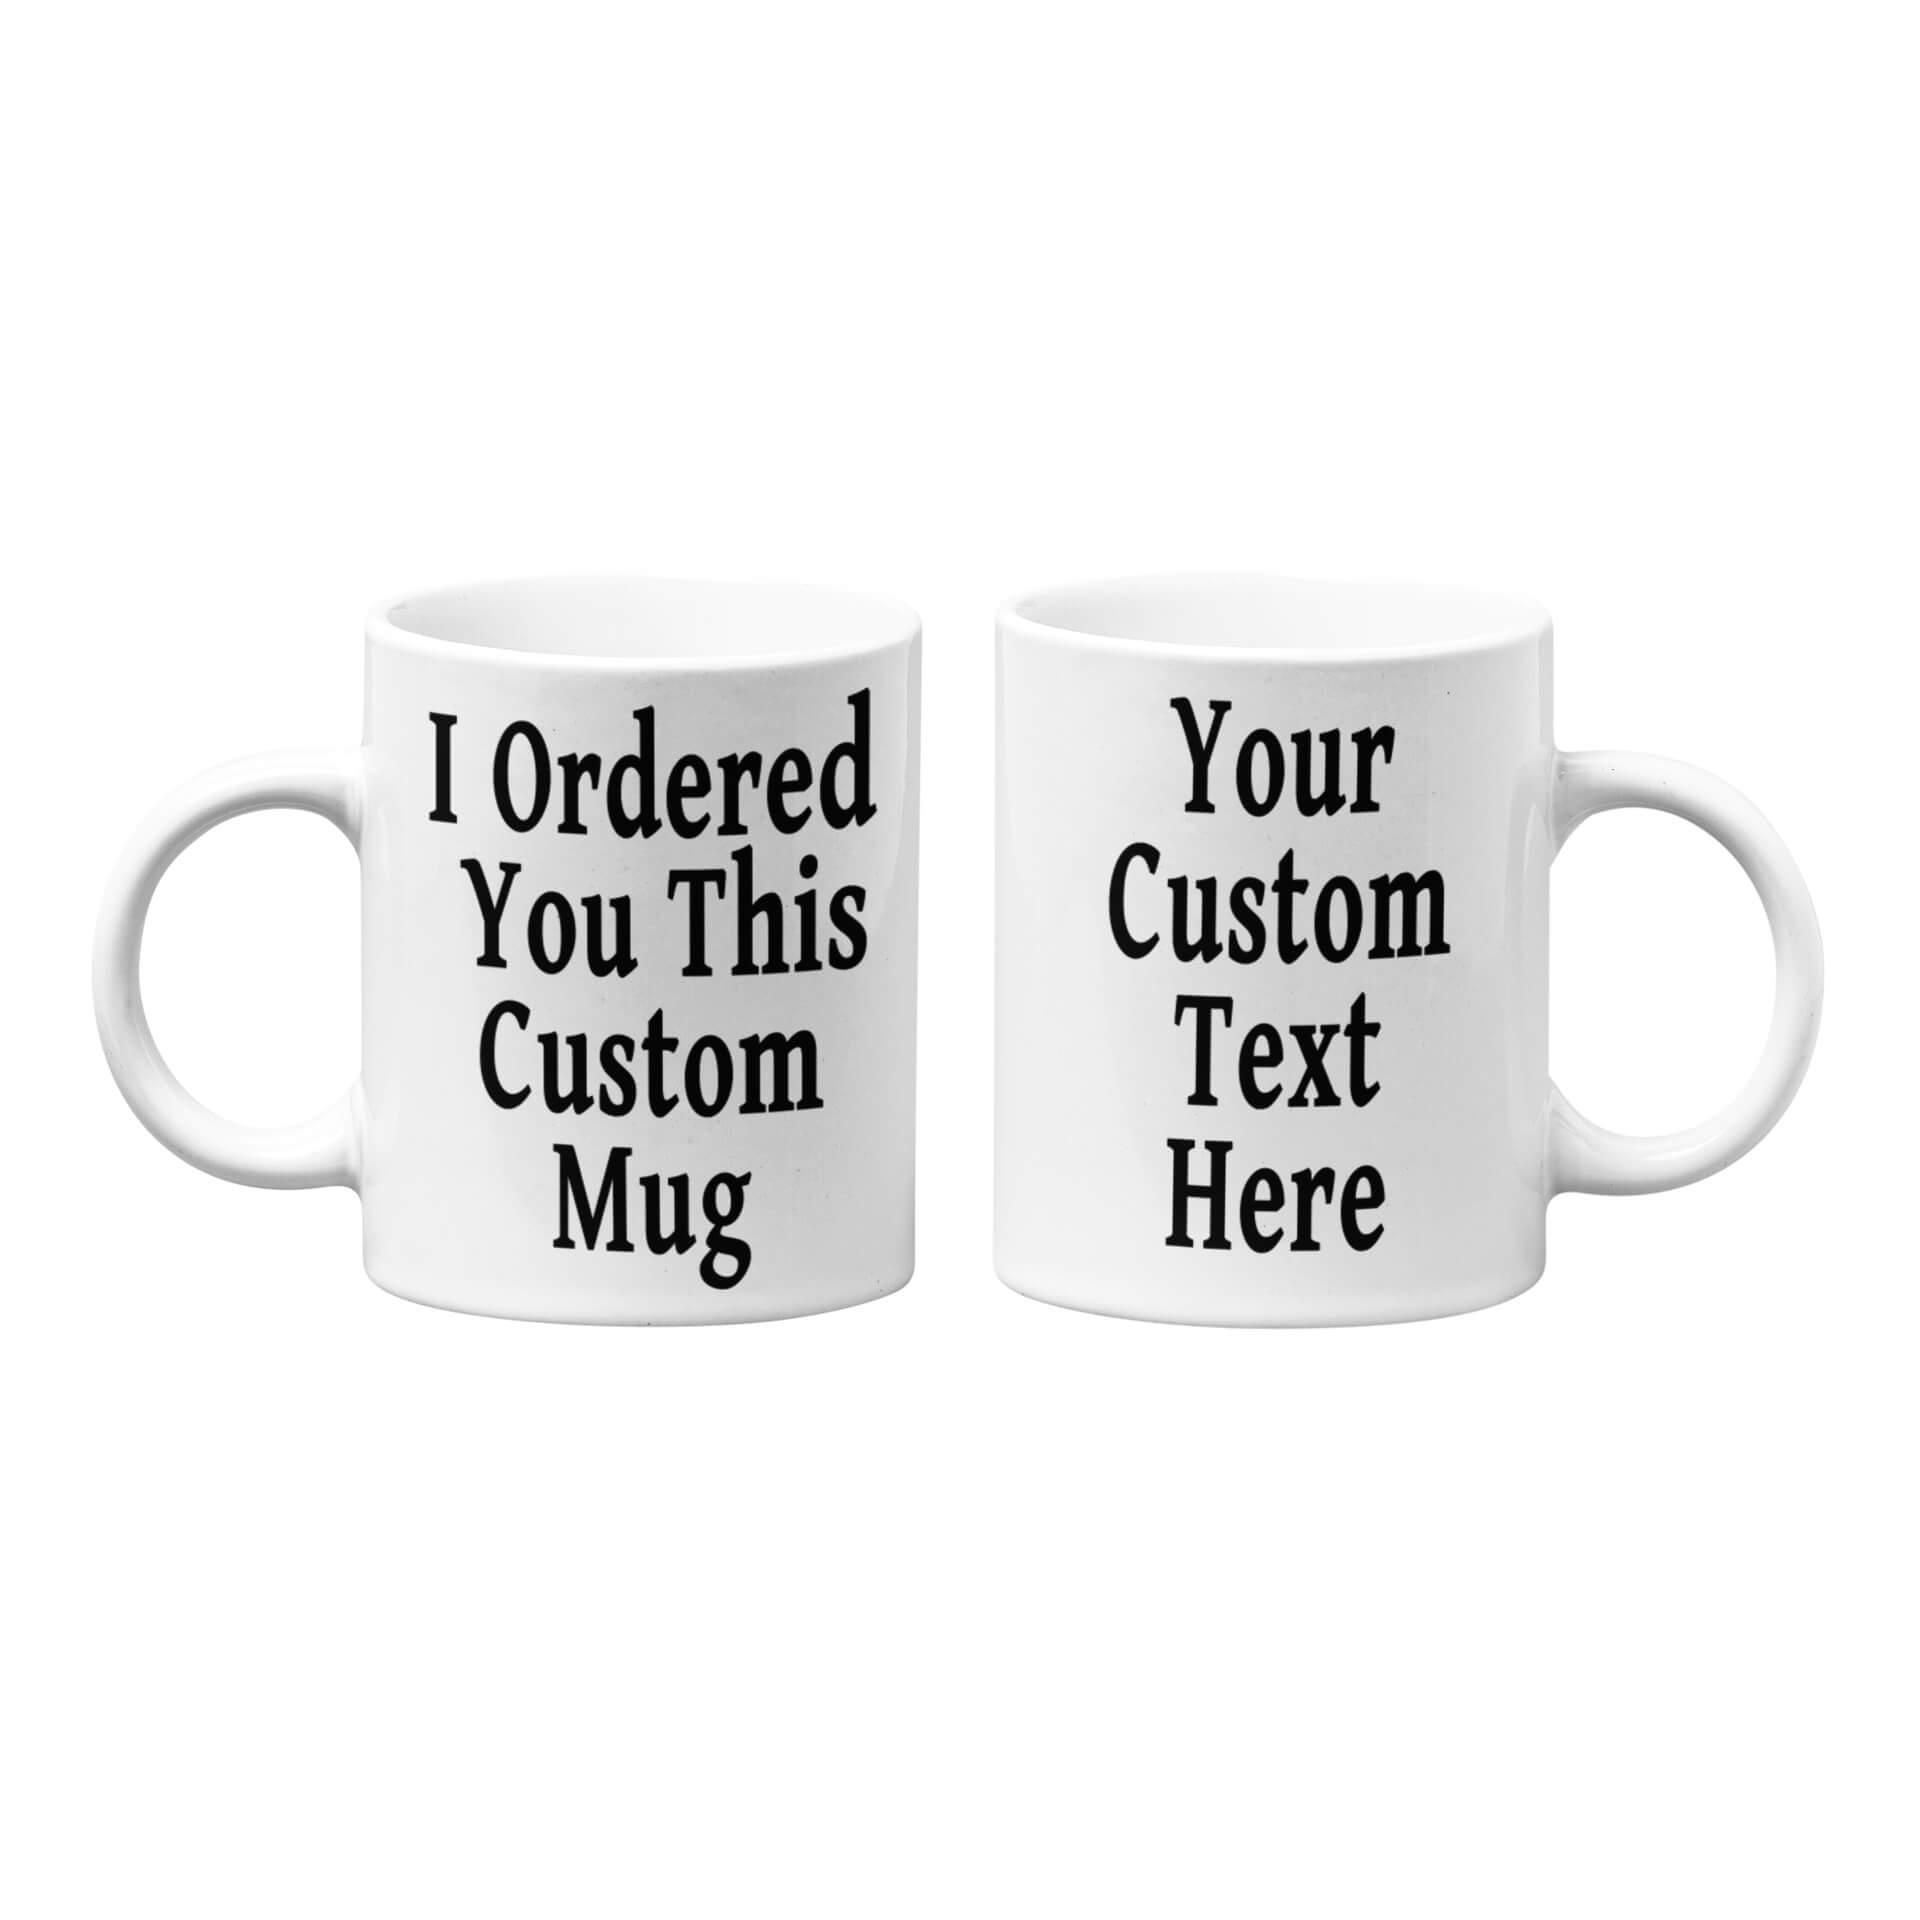 I Ordered You This Custom Mug